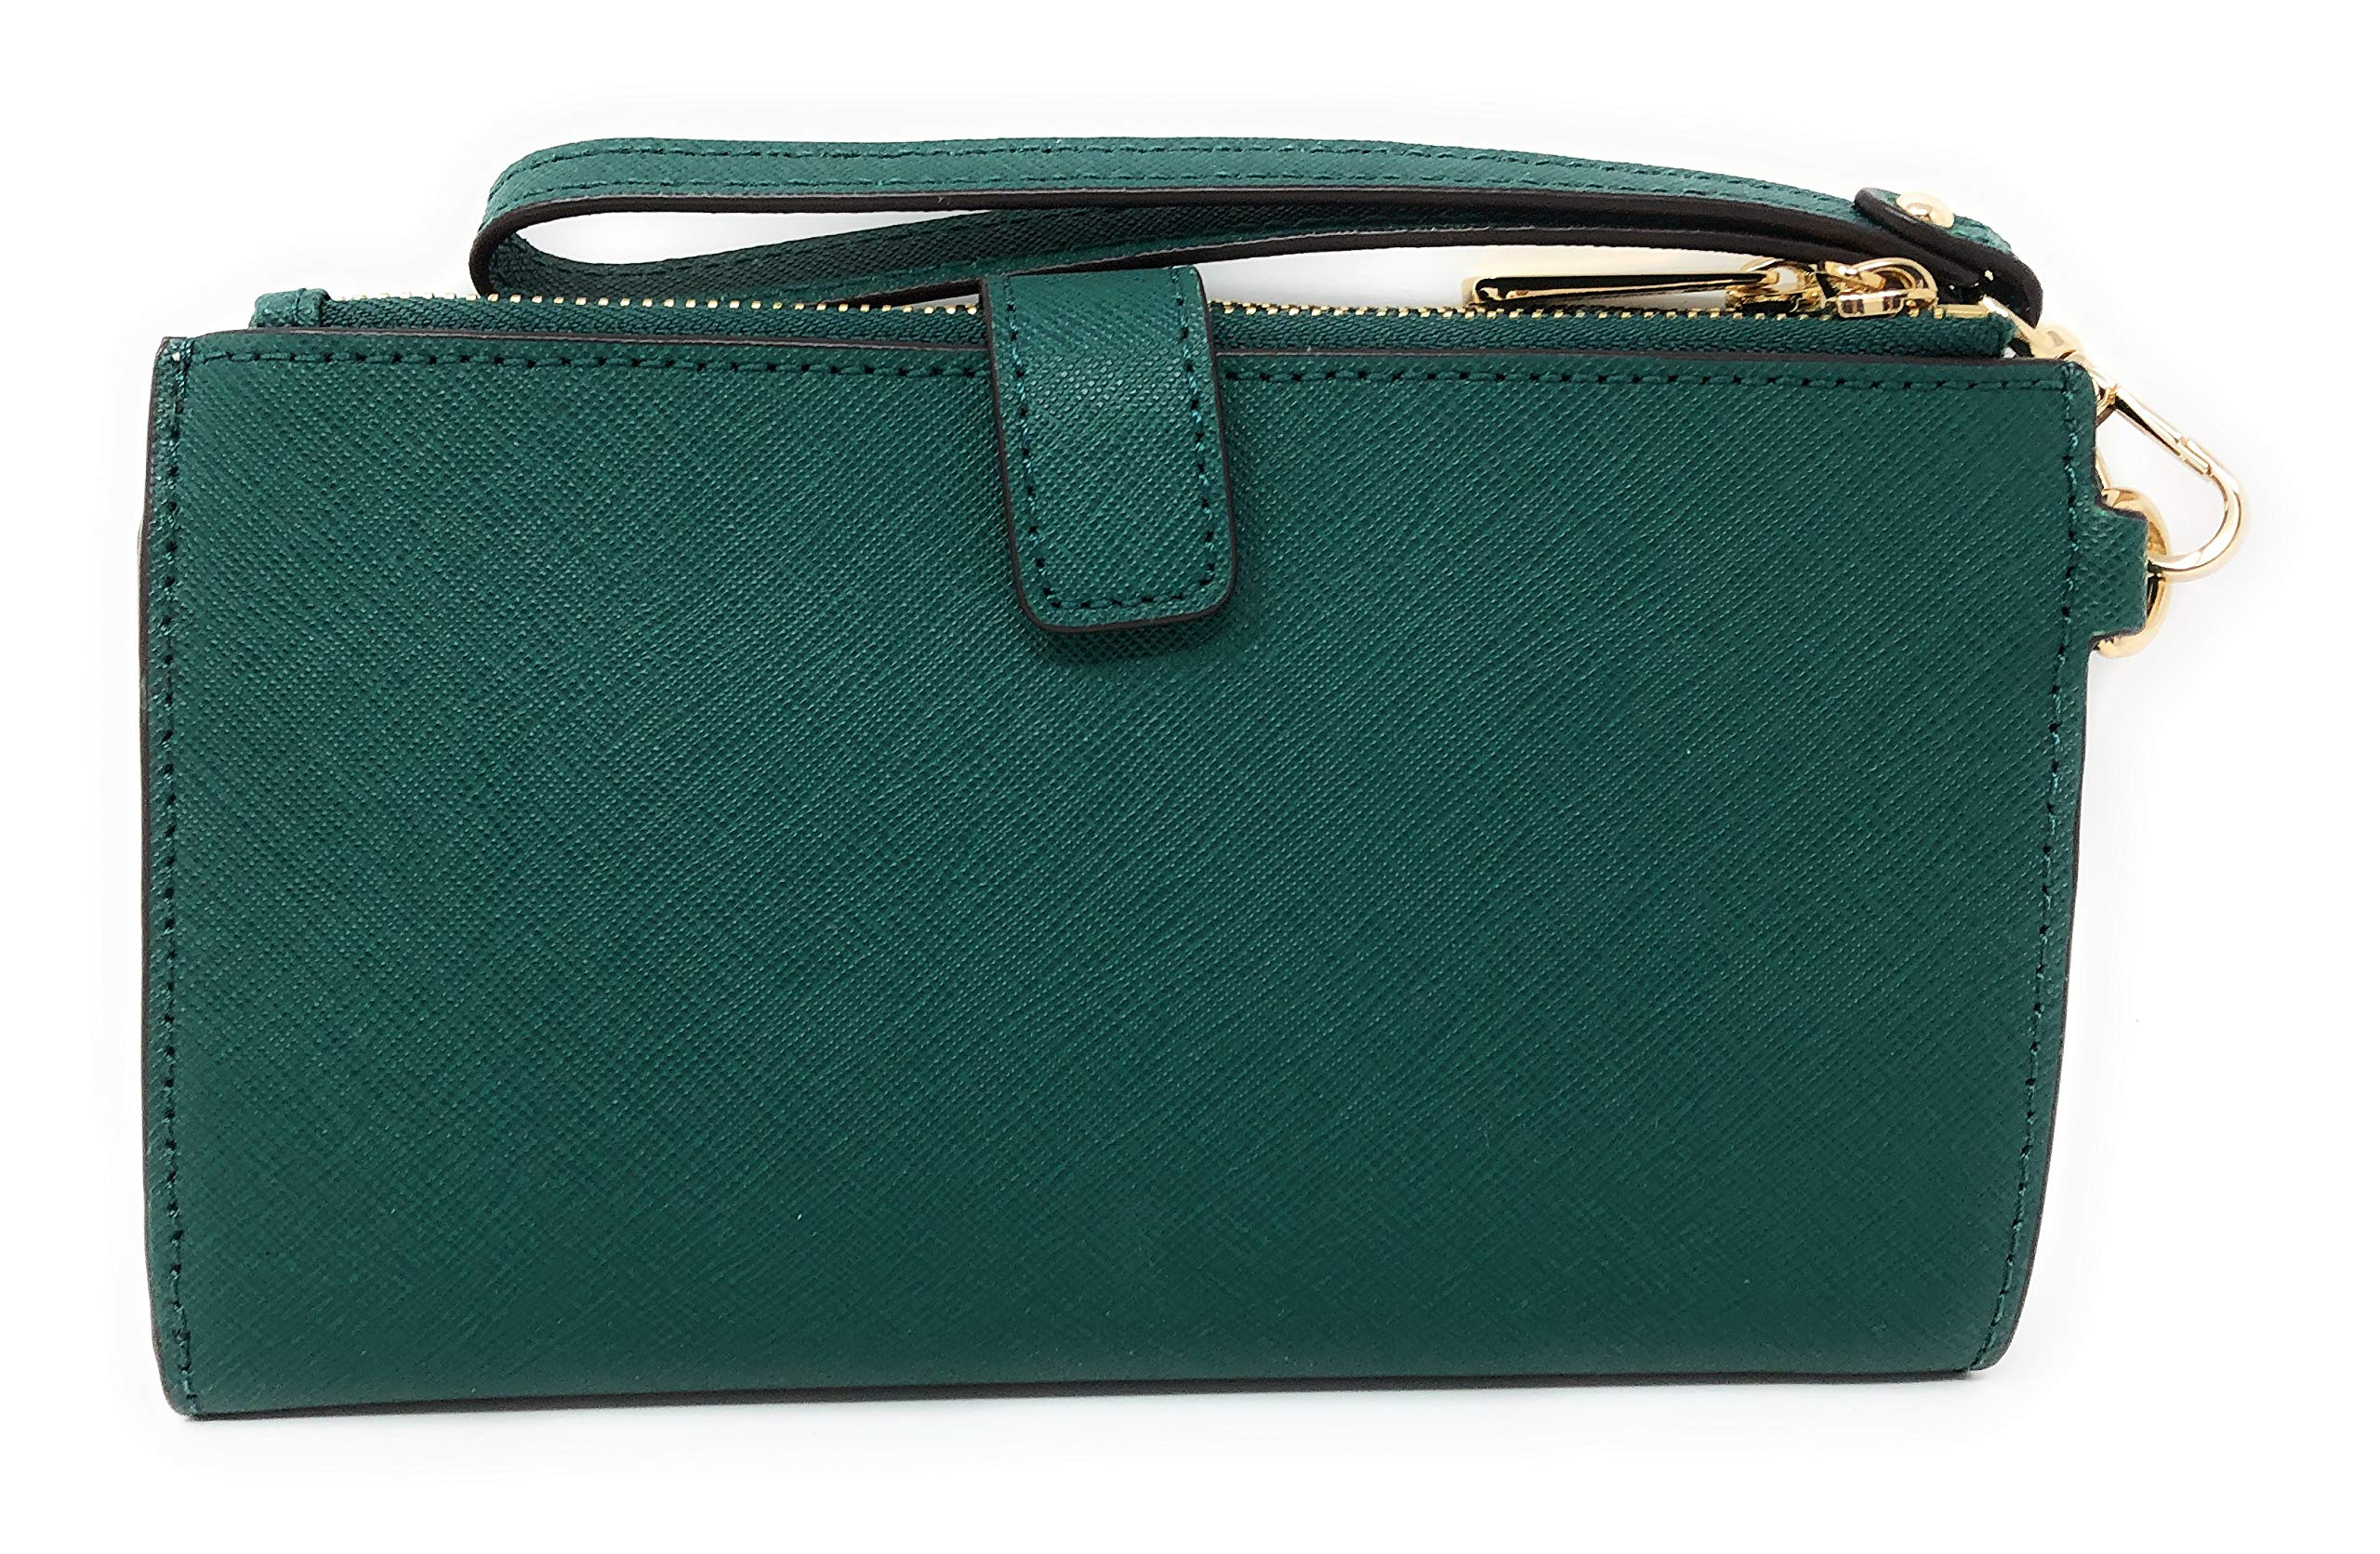 Michael Kors Jet Set Travel Double Zip Saffiano Leather Wristlet Wallet in Emerald by Michael Kors (Image #2)